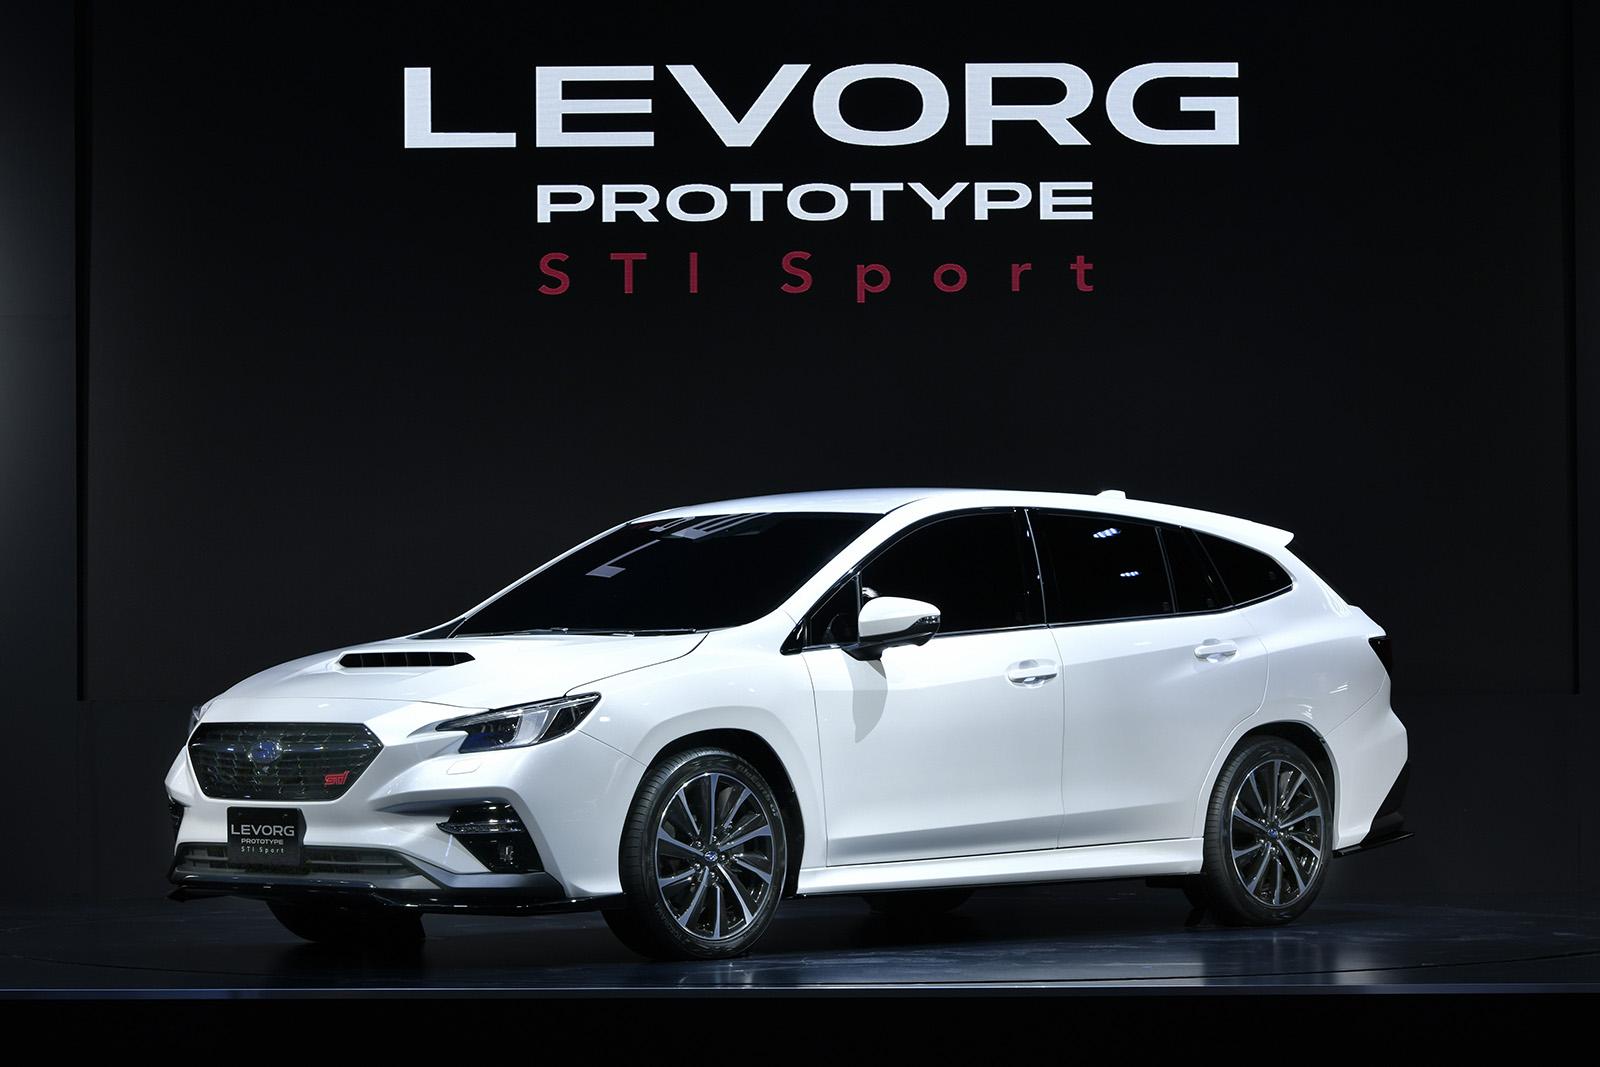 Subaru-Levorg-STI-Sport-Prototype-3